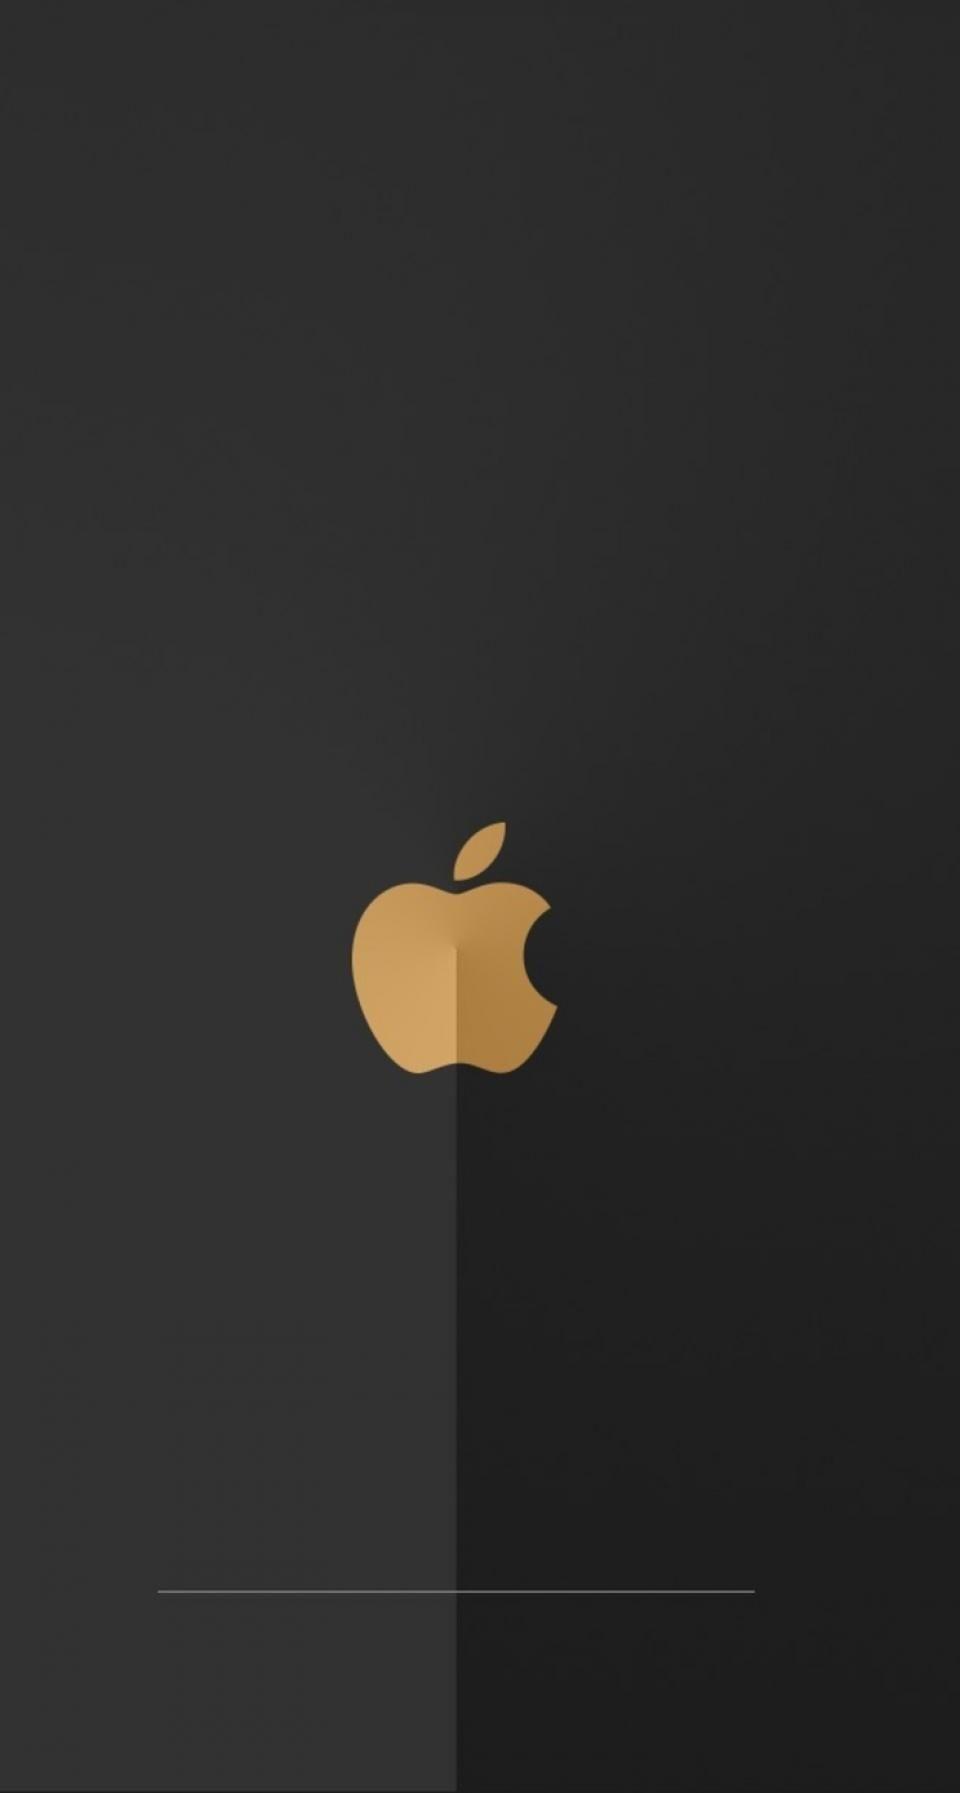 iphone 6 wallpaper retina mountain - photo #34